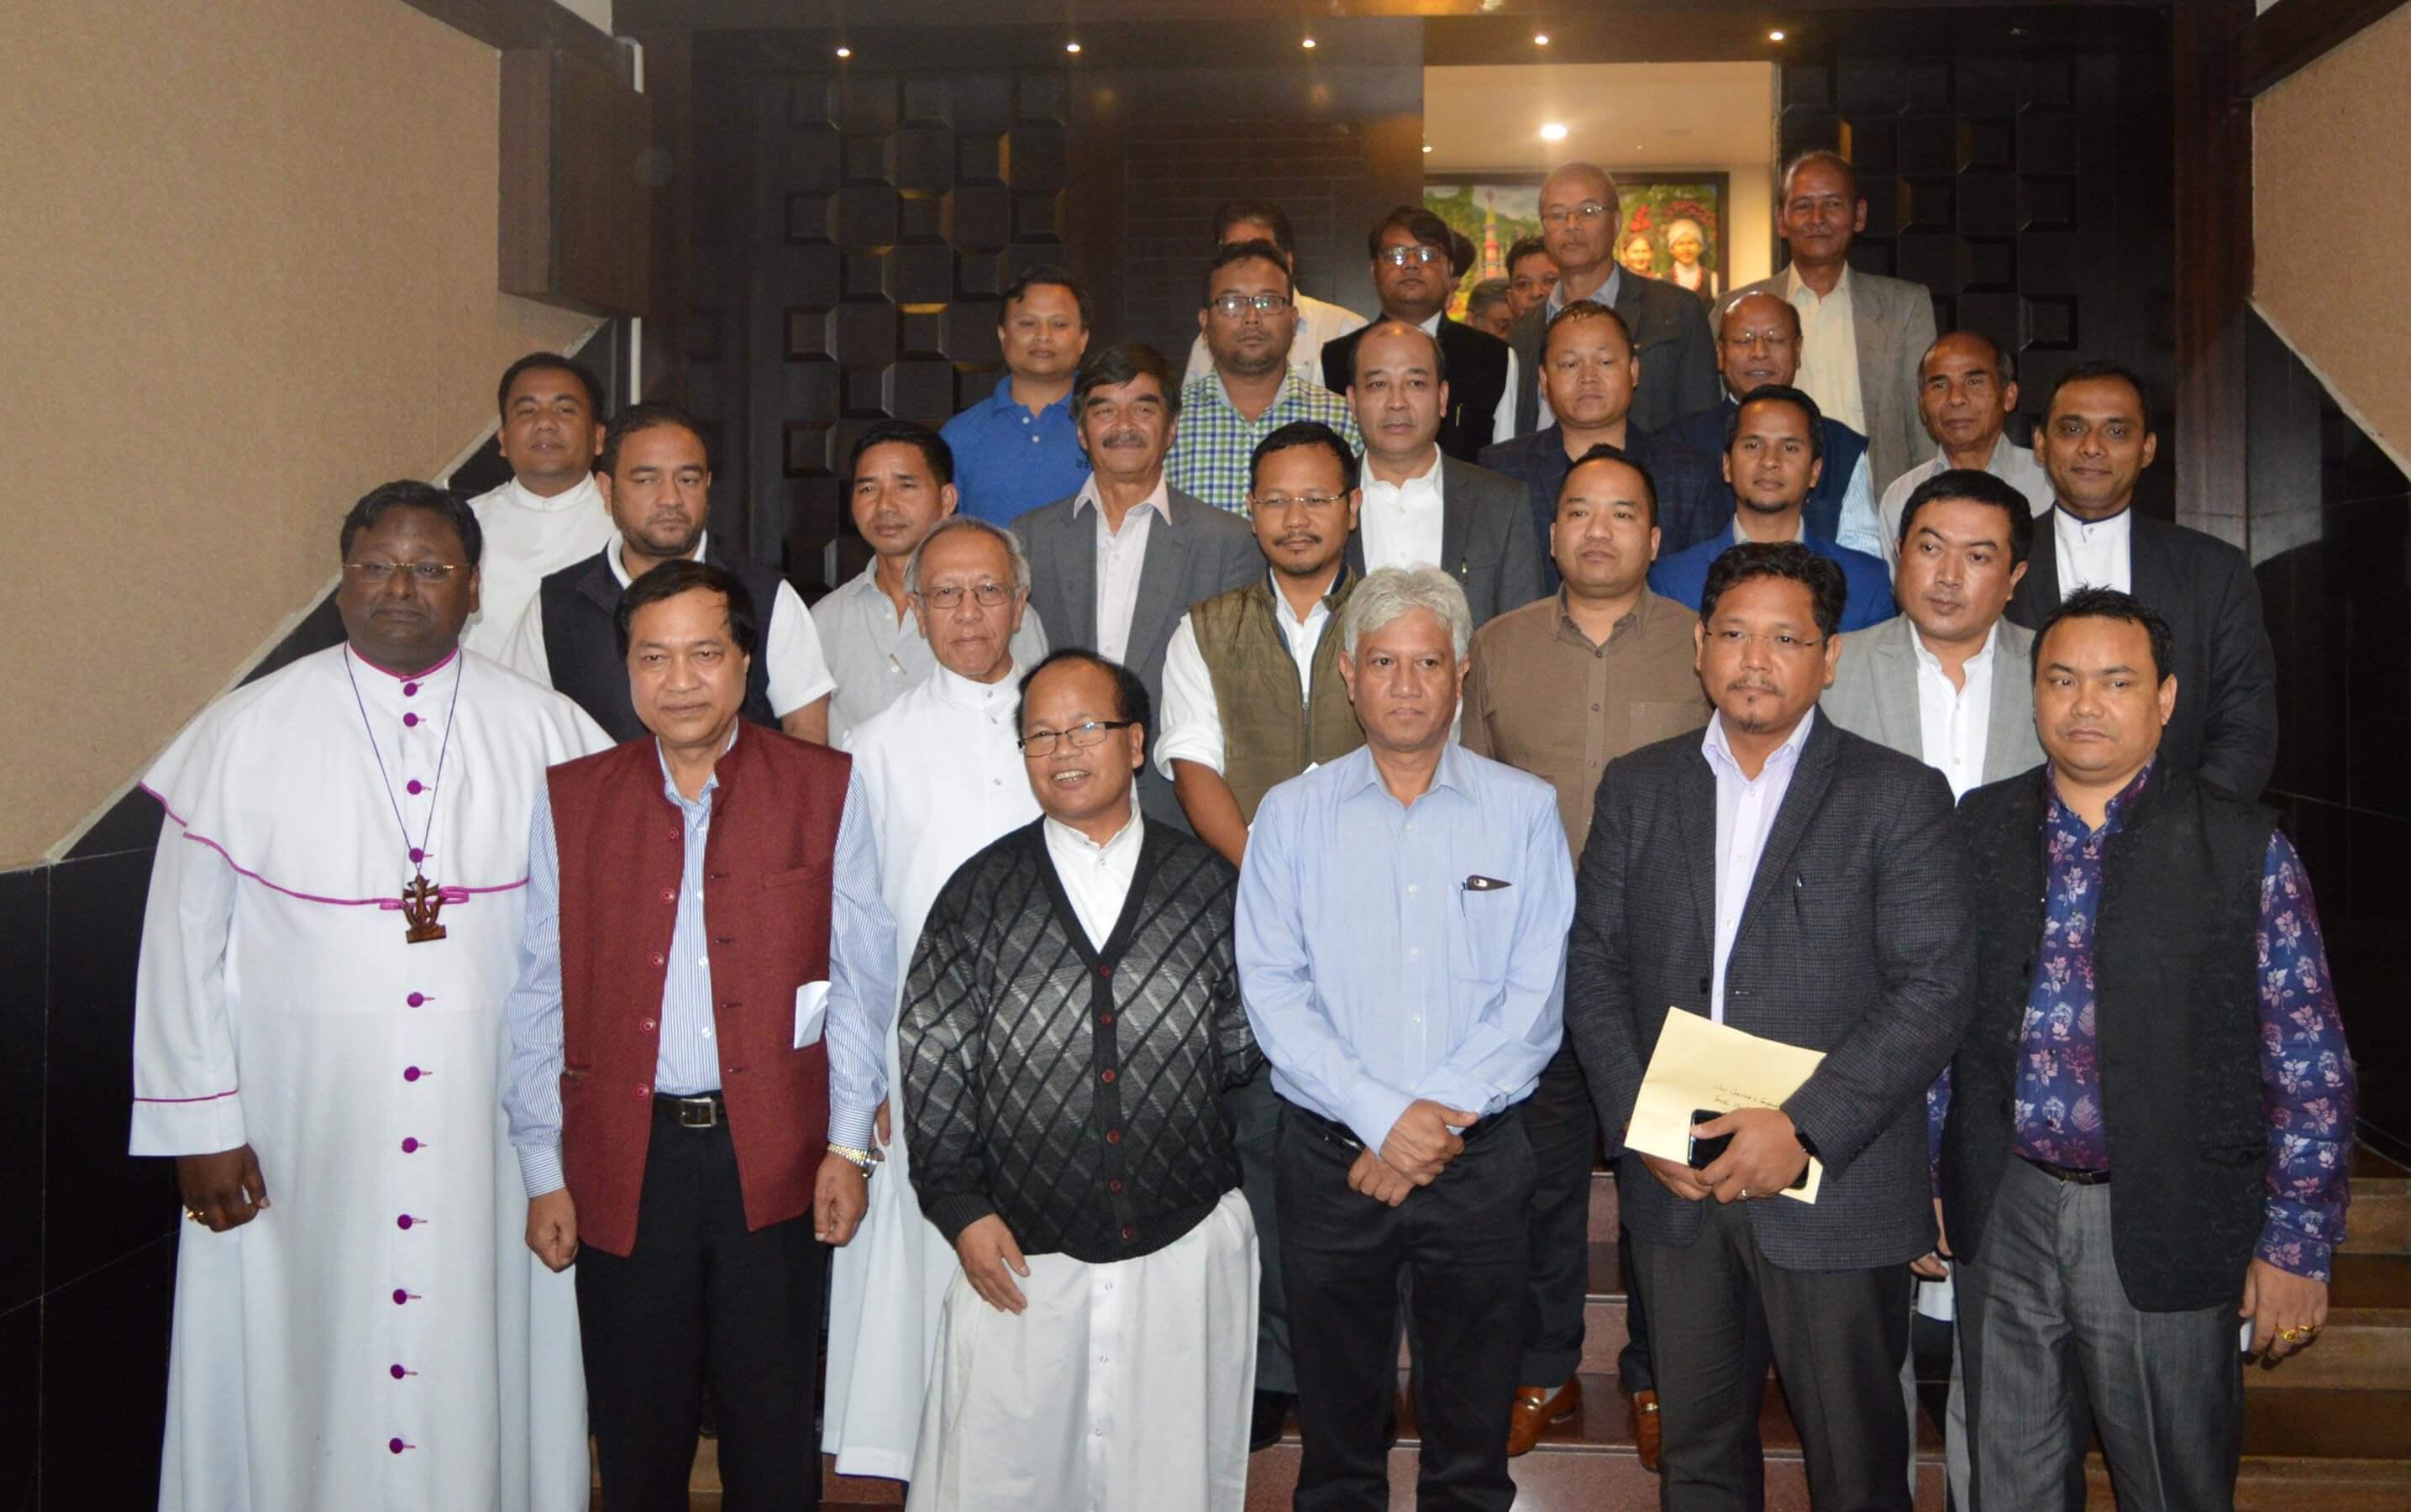 Conrad meets Church leaders, pressure groups